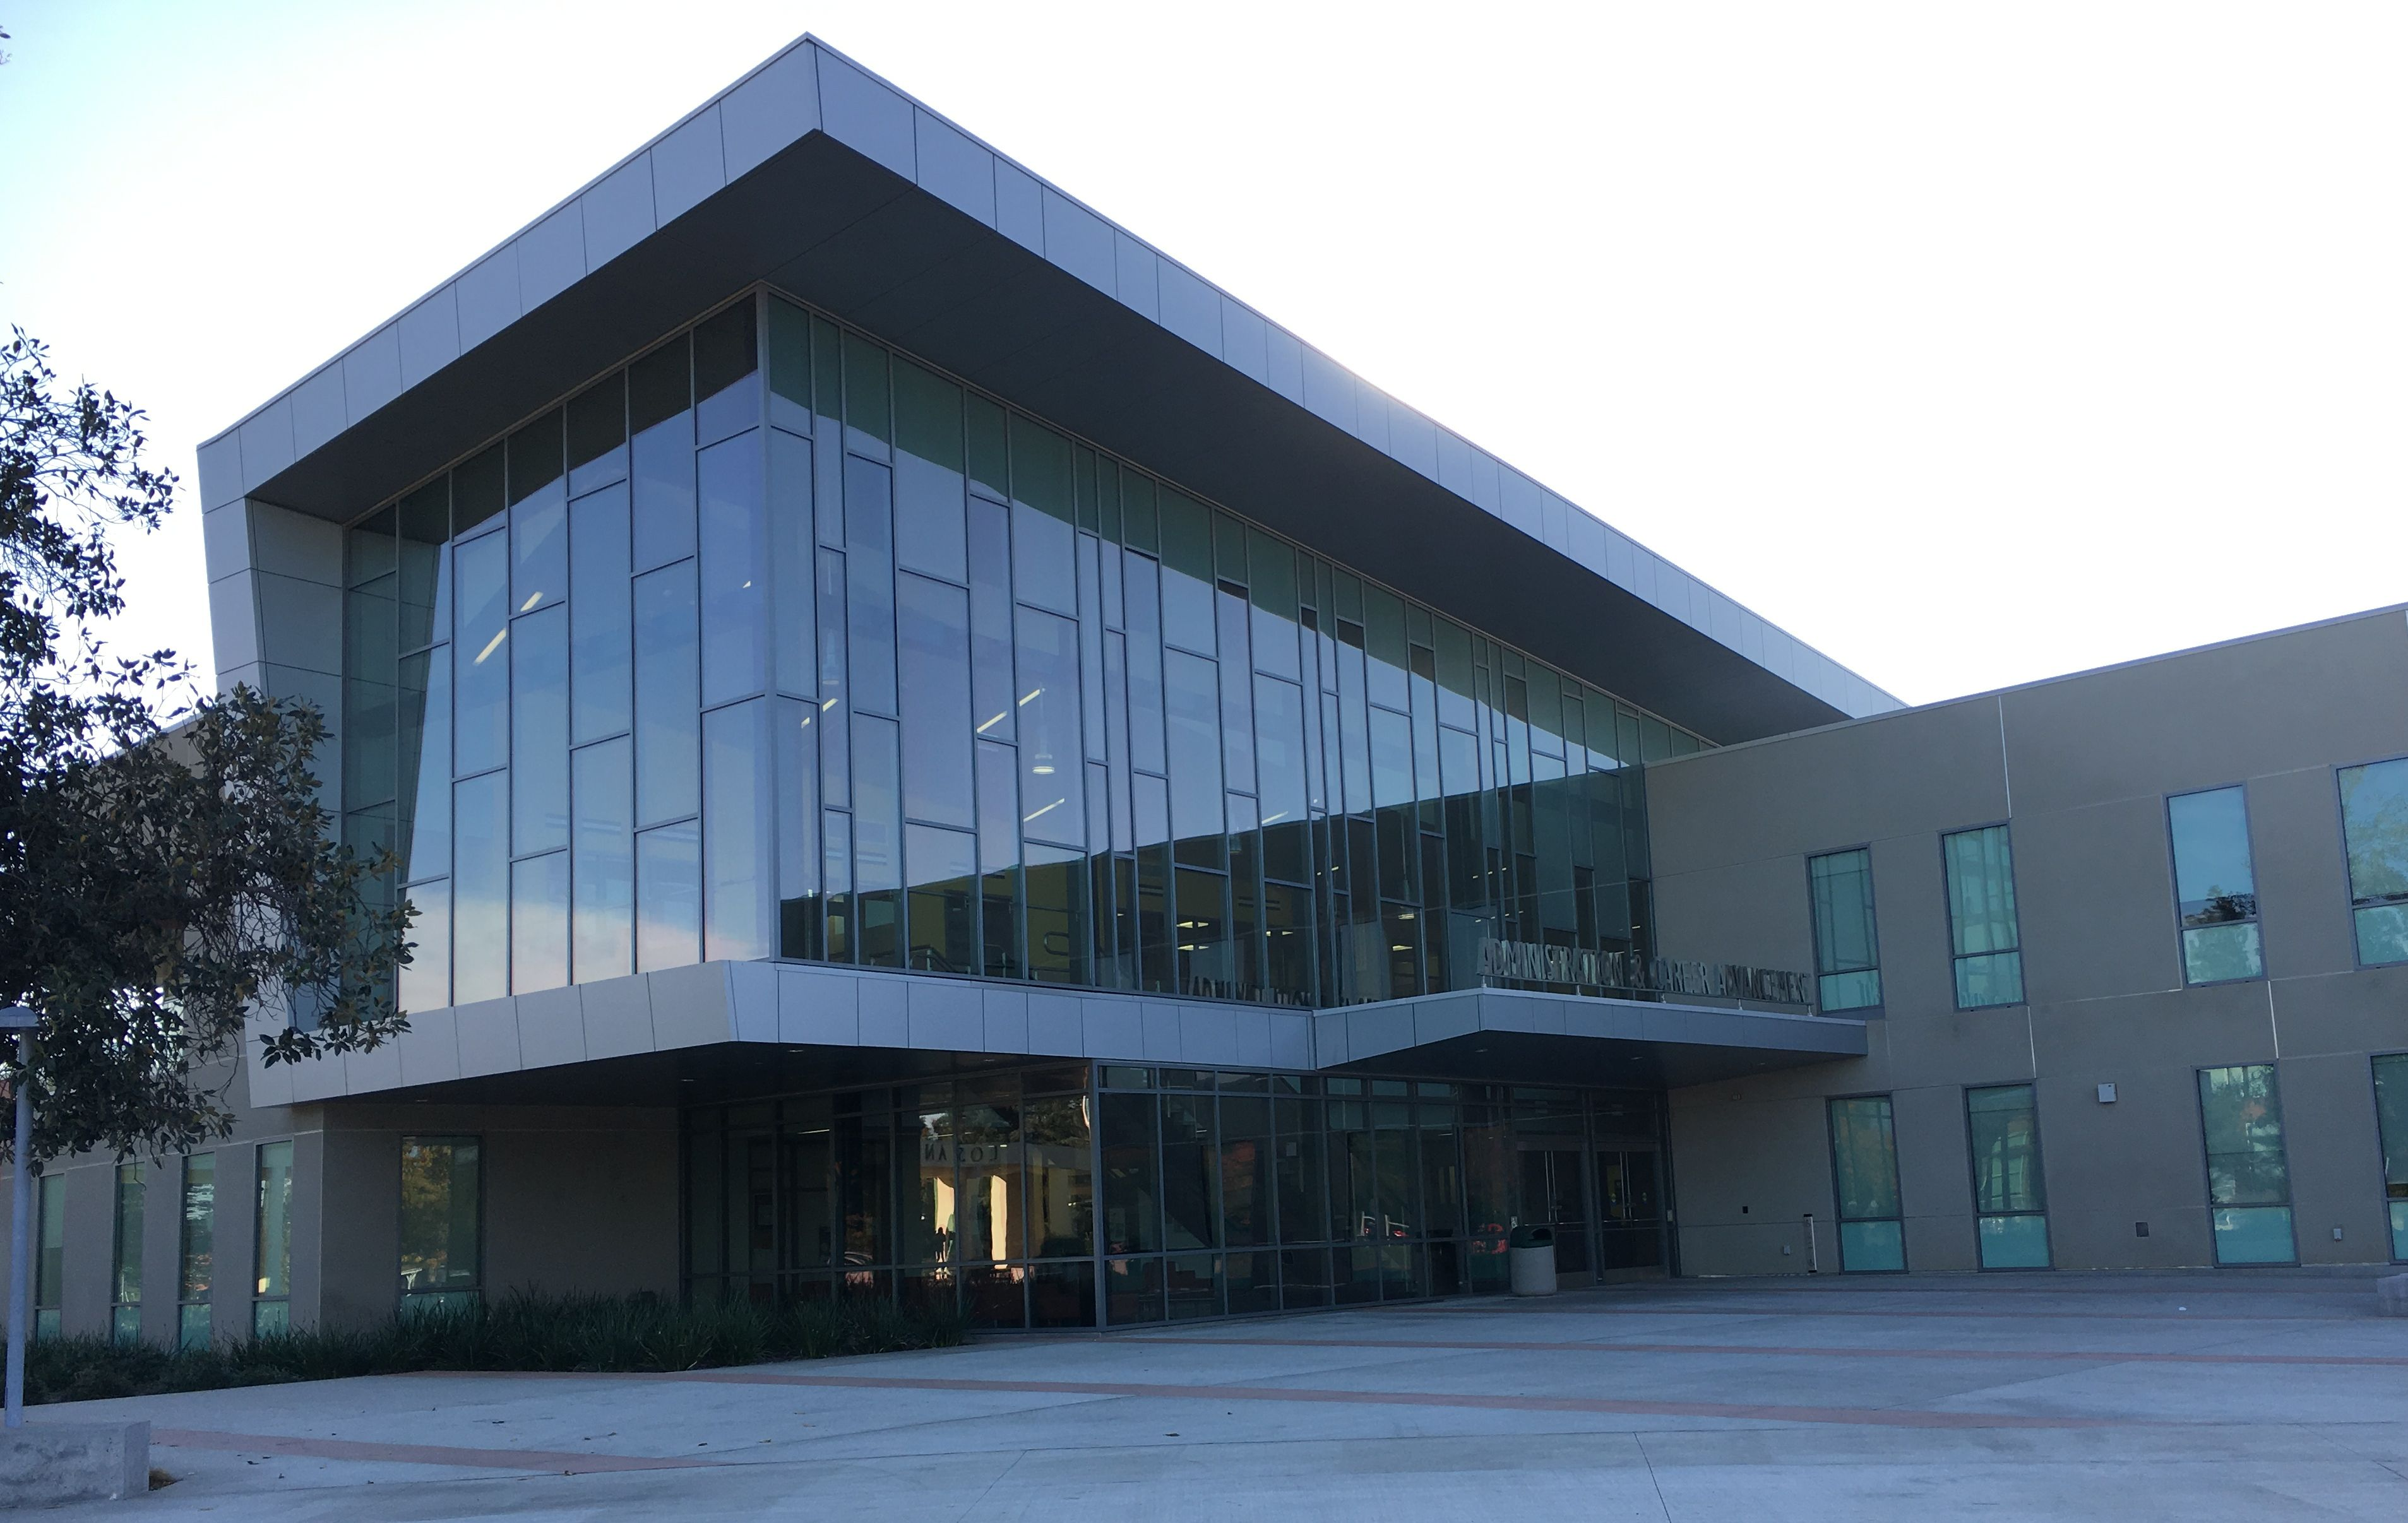 Los Angeles Valley College- Valley Glen Gateway Building